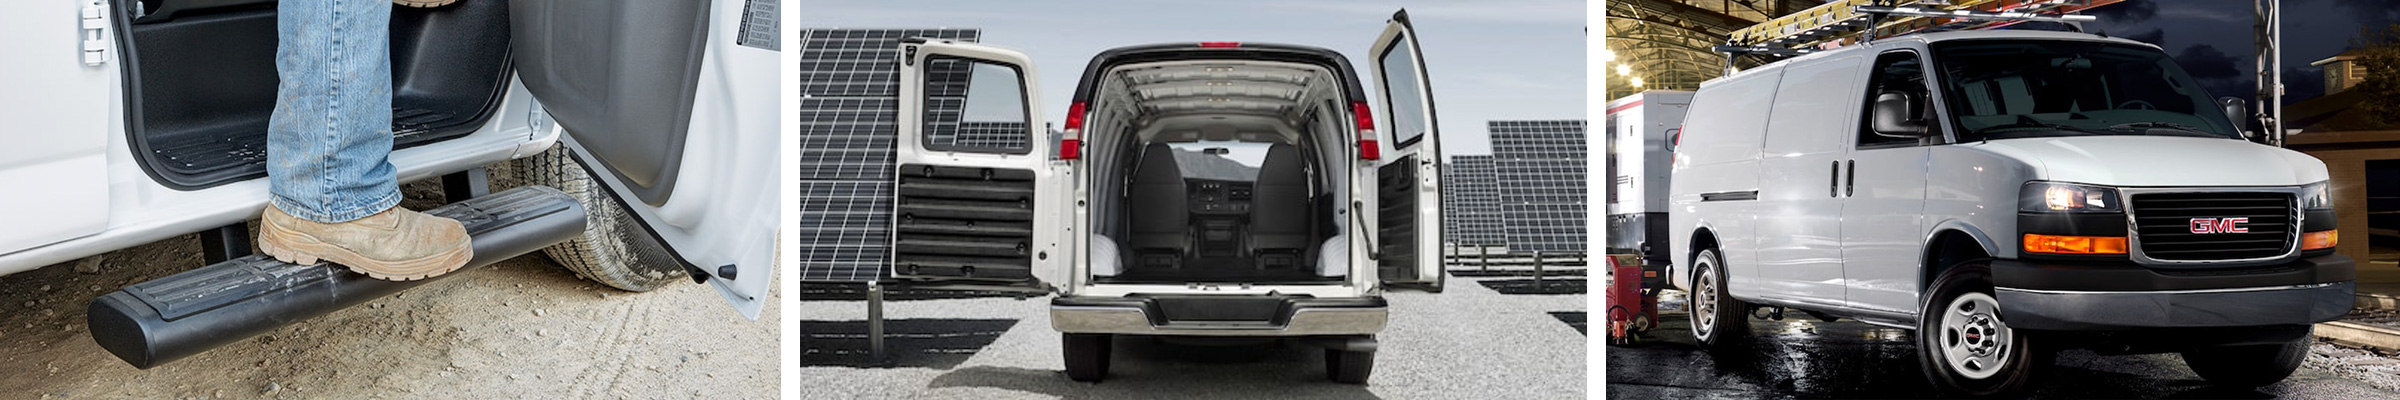 2020 GMC Savana Cargo Van For Sale West Palm Beach FL   Wellington